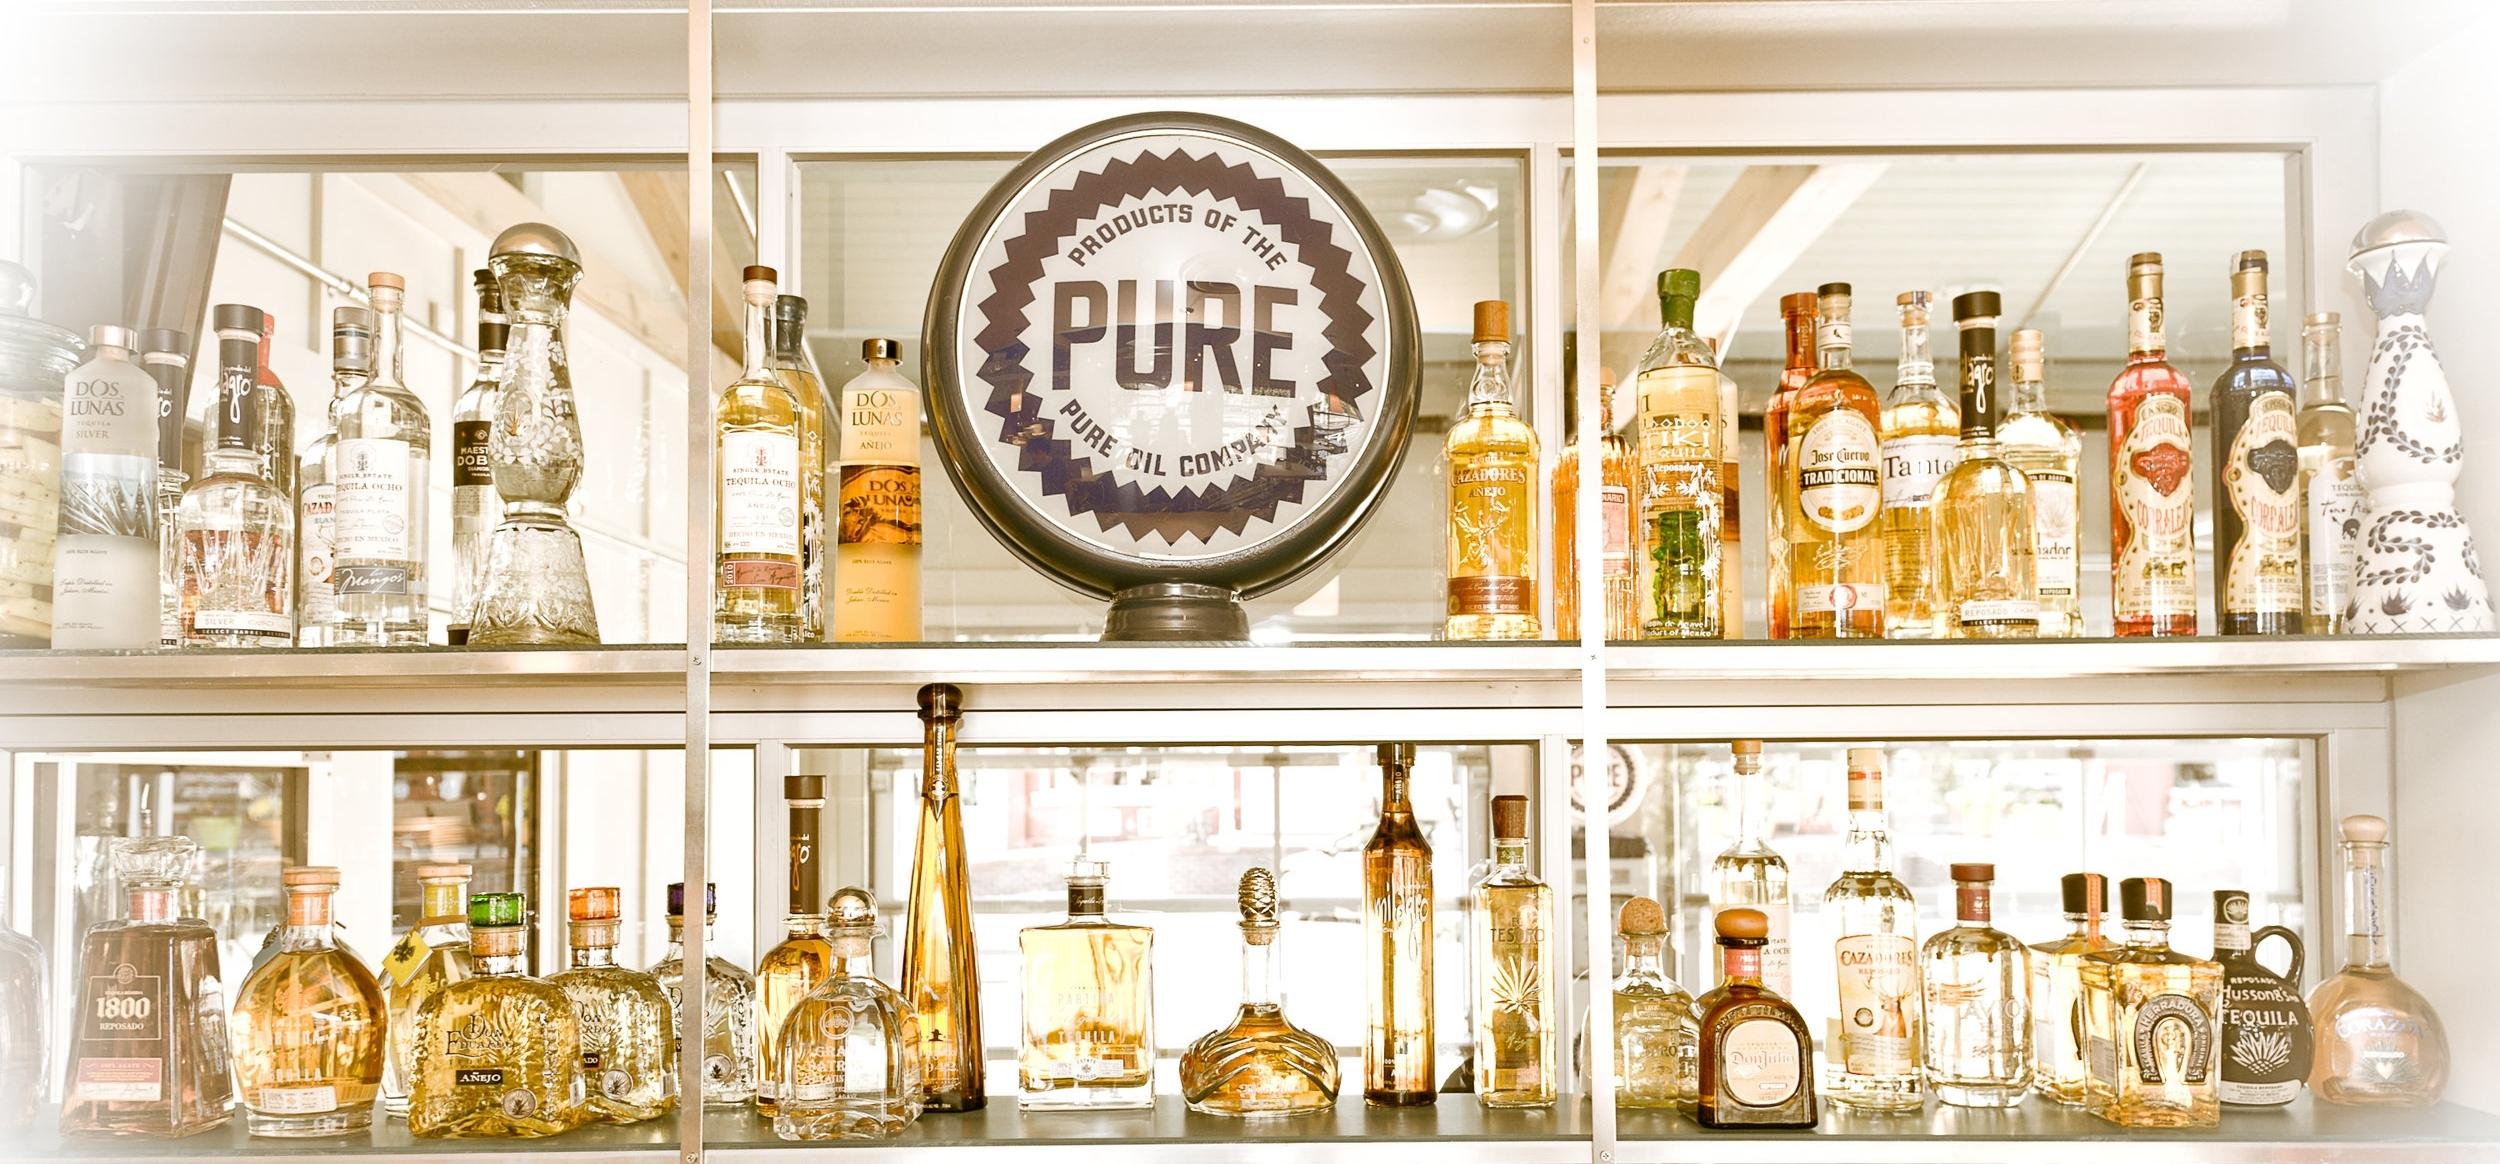 Pure-Taqueria-Tequila-Bar.jpg